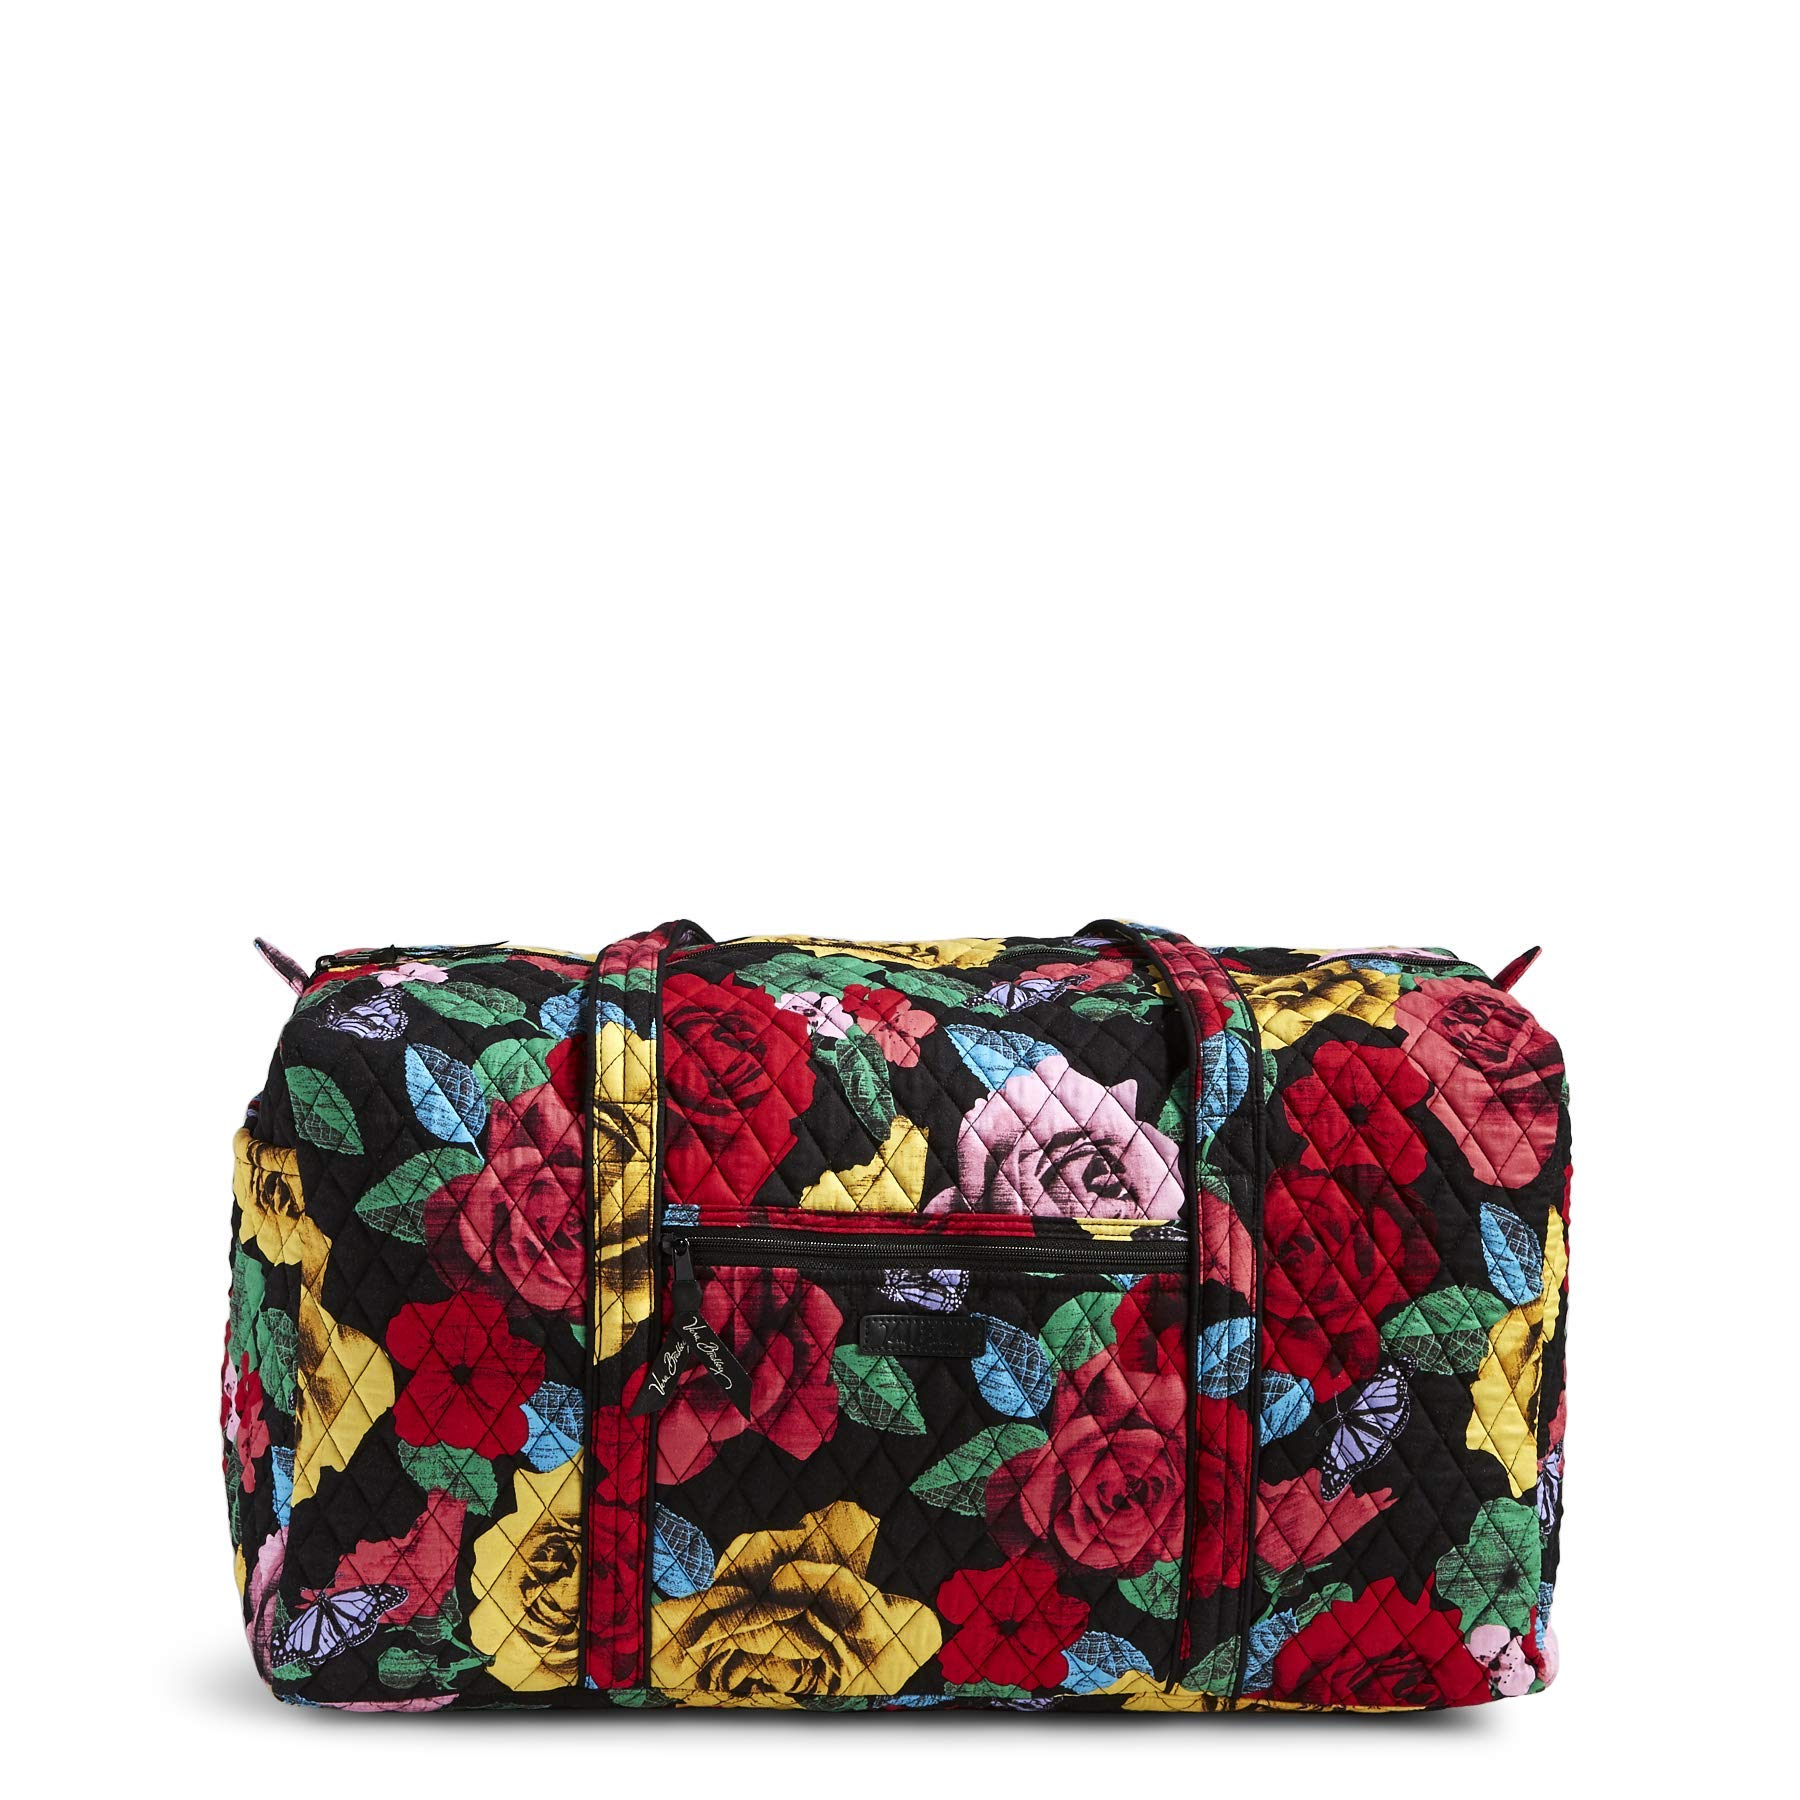 Women's Large Duffel, Signature Cotton, Havana Rose